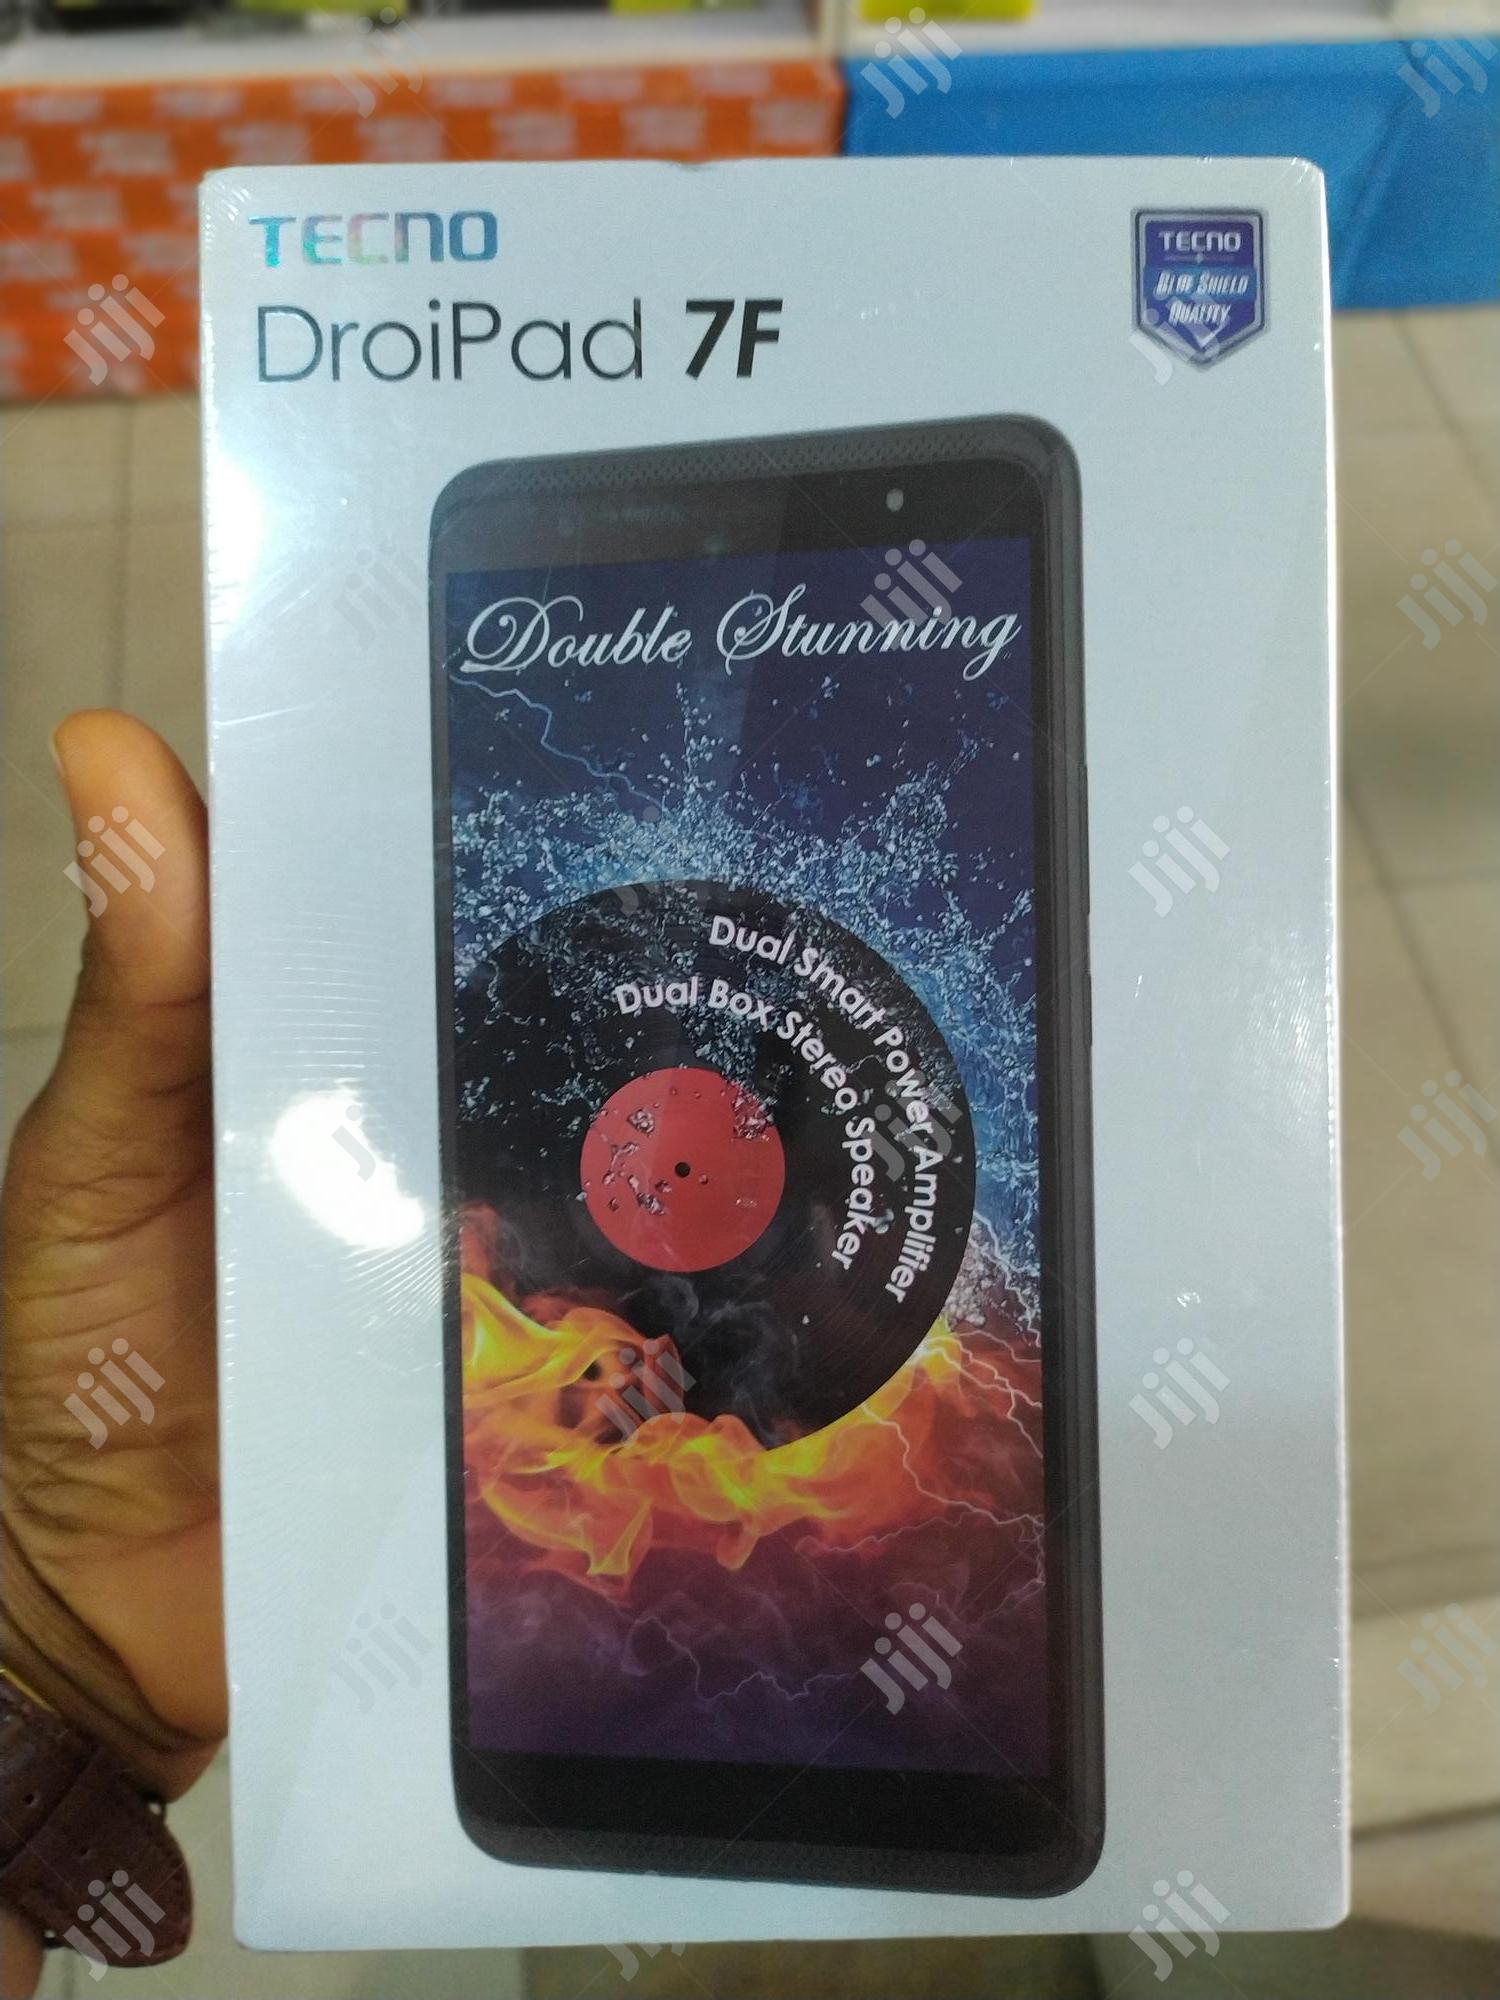 New Tecno DroiPad 7E 16 GB